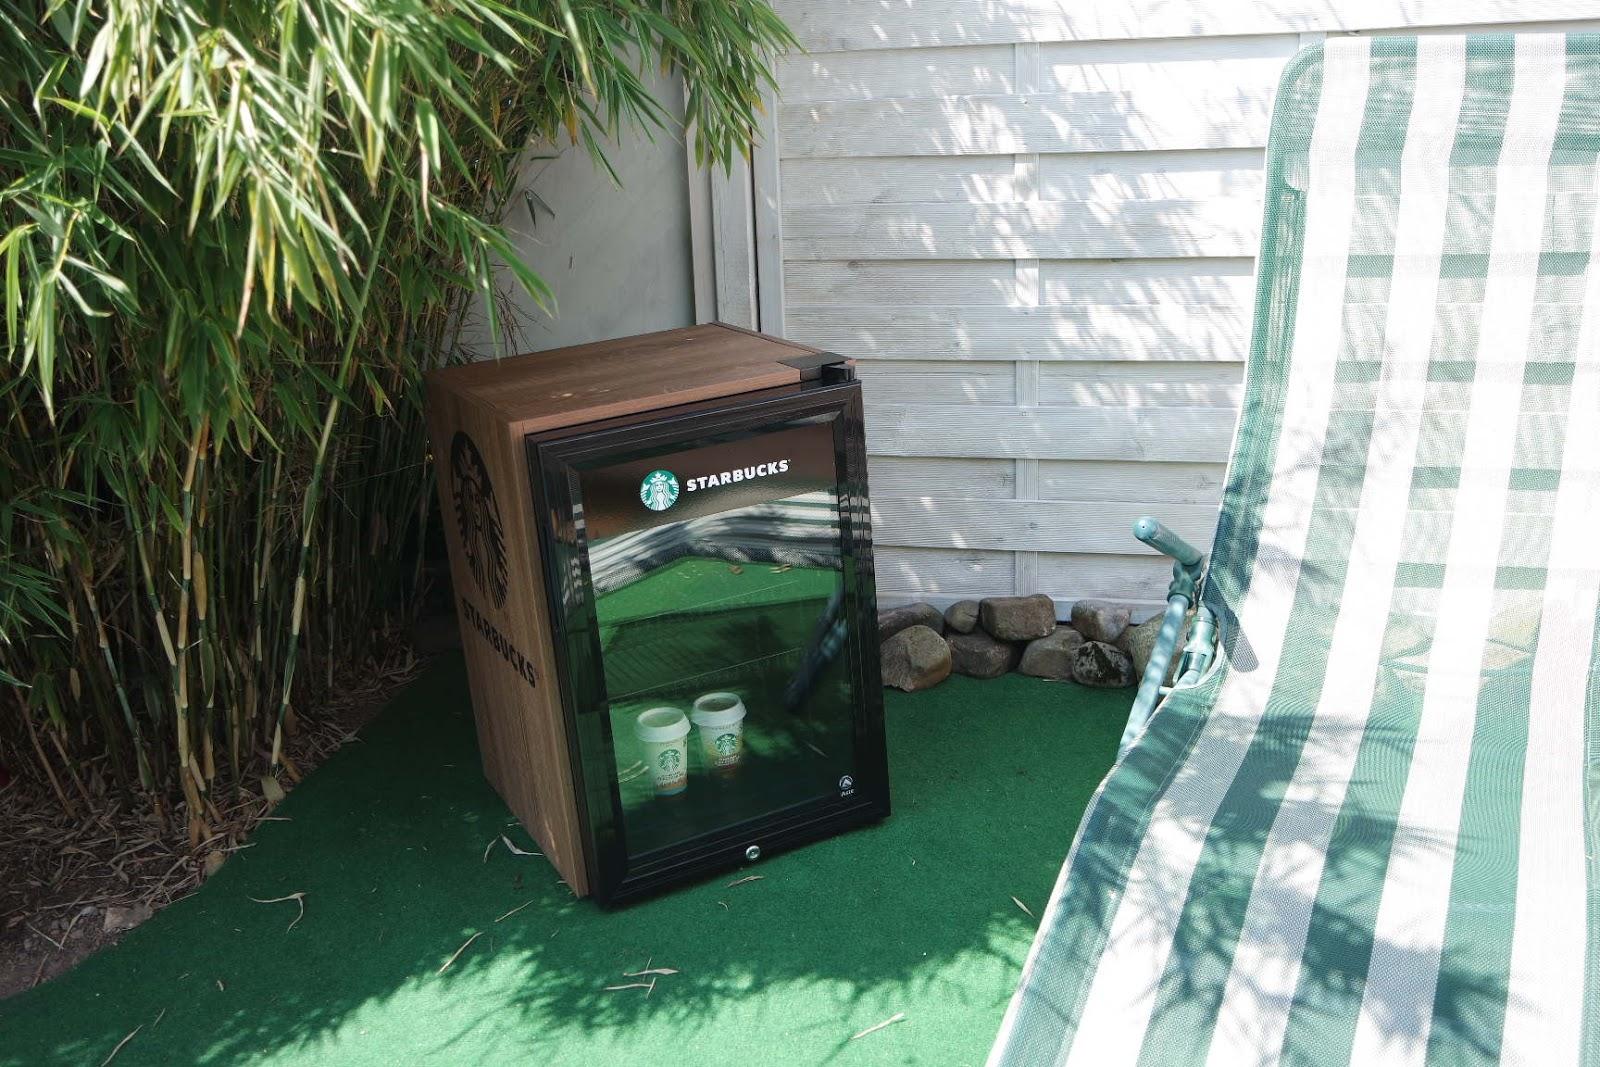 Kleiner Kühlschrank Ok : ᐅ severin ks mini kühlschrank die hausbar